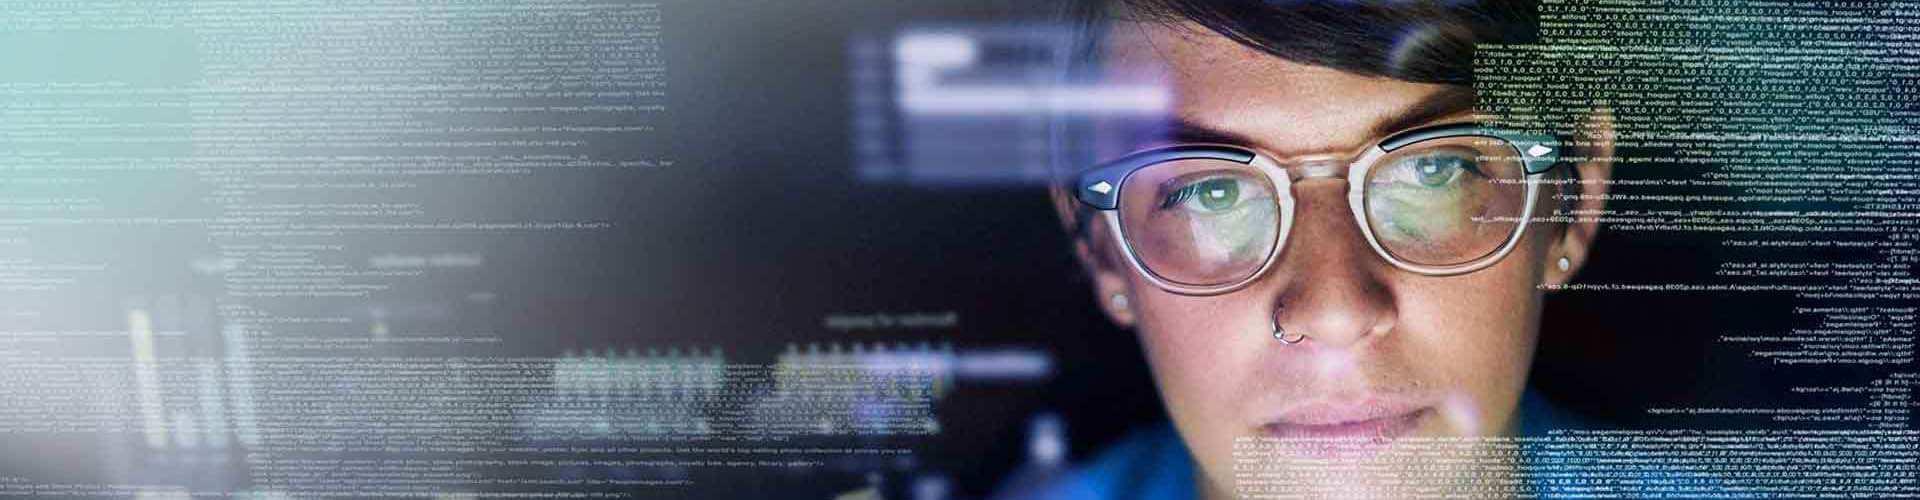 Female sitting behind computer.